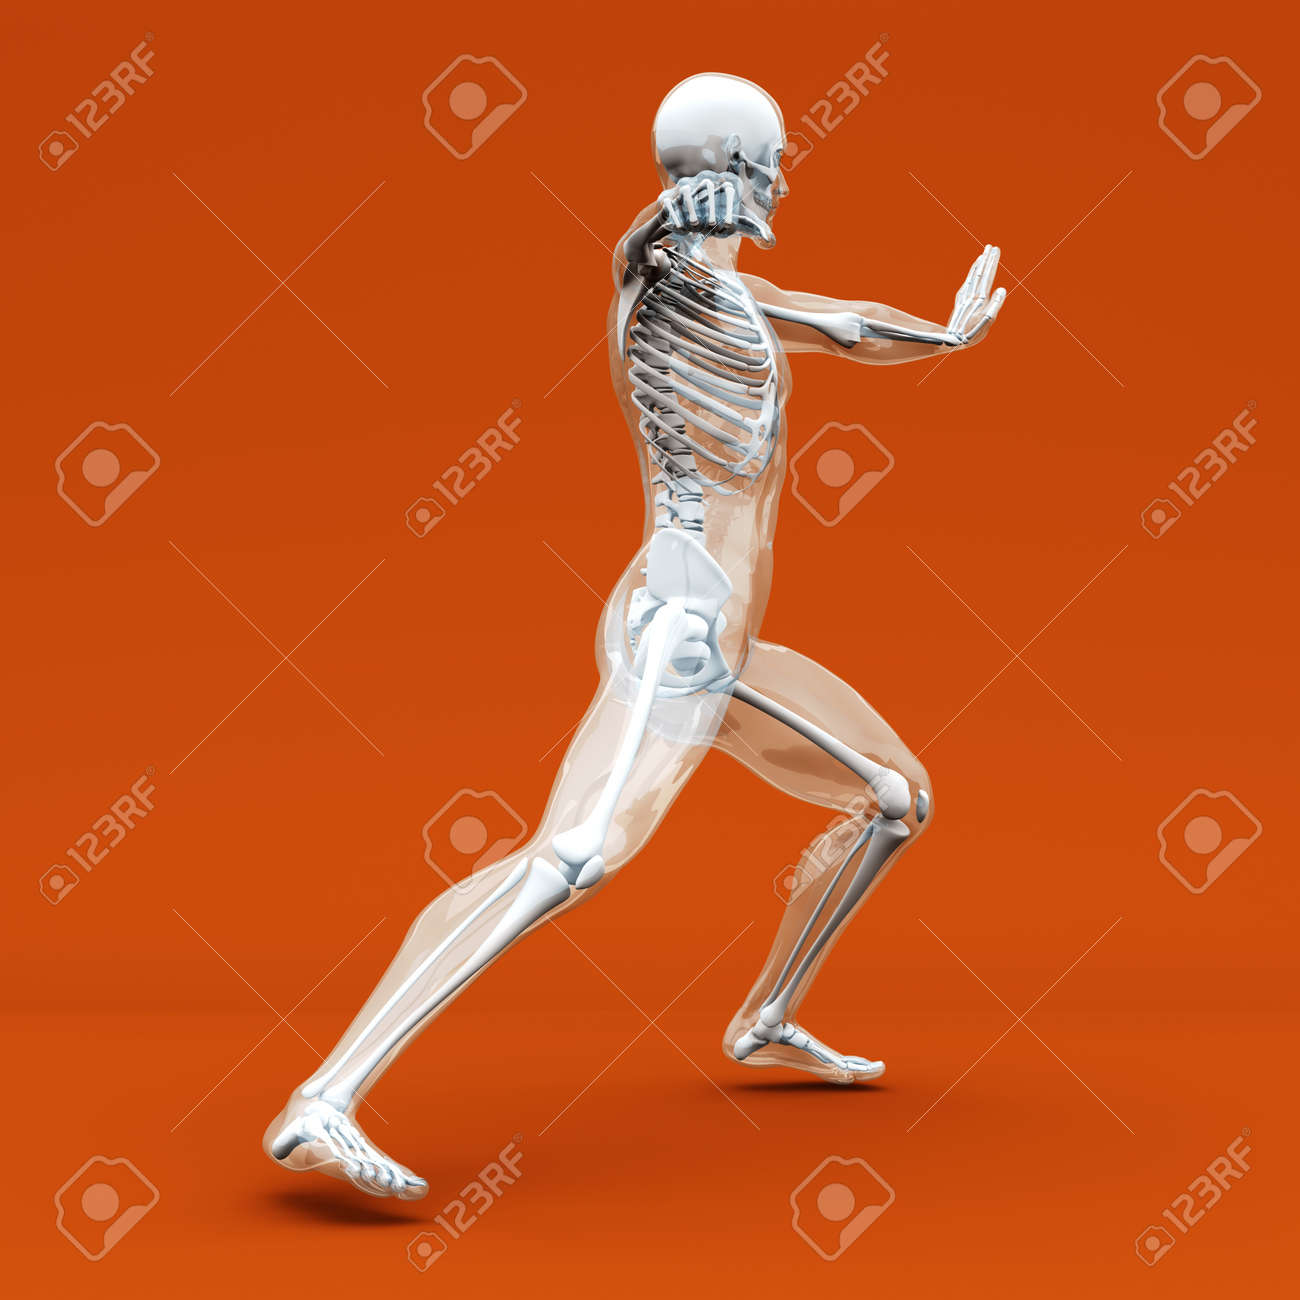 A Medical Visualisation Of Human Anatomy 3D Rendered Illustration Stock